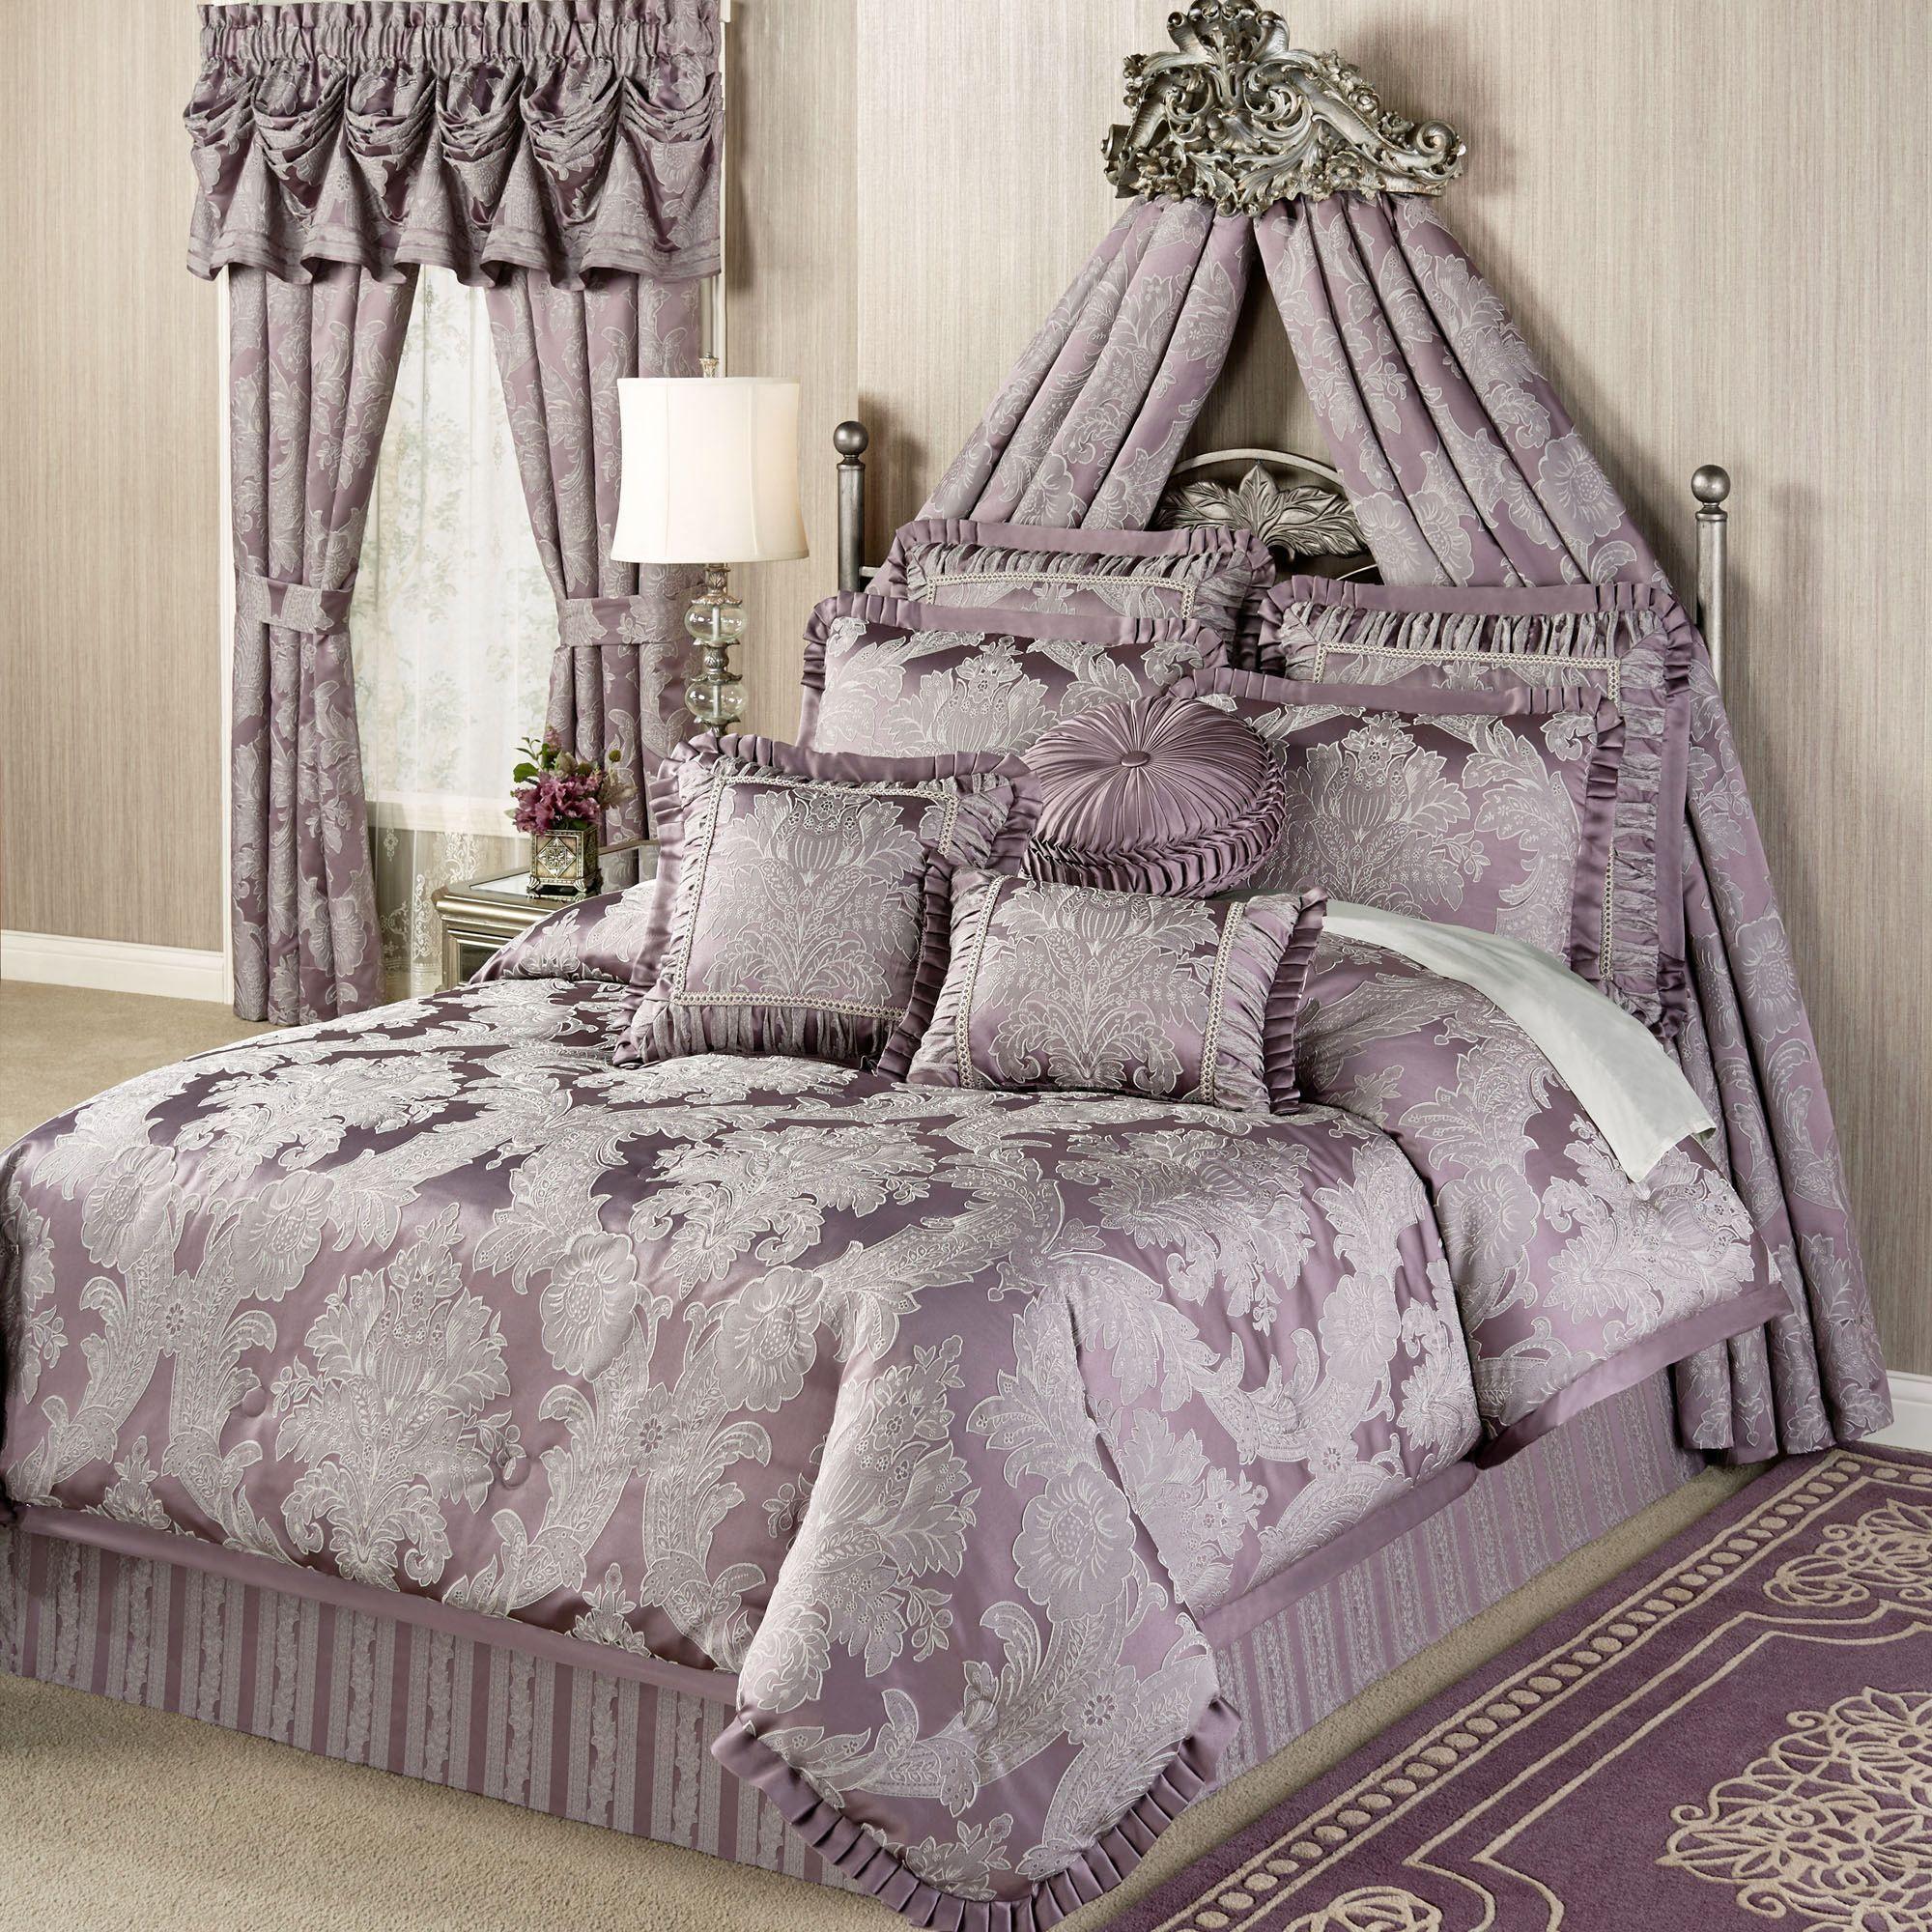 Ambience Damask Comforter Bedding